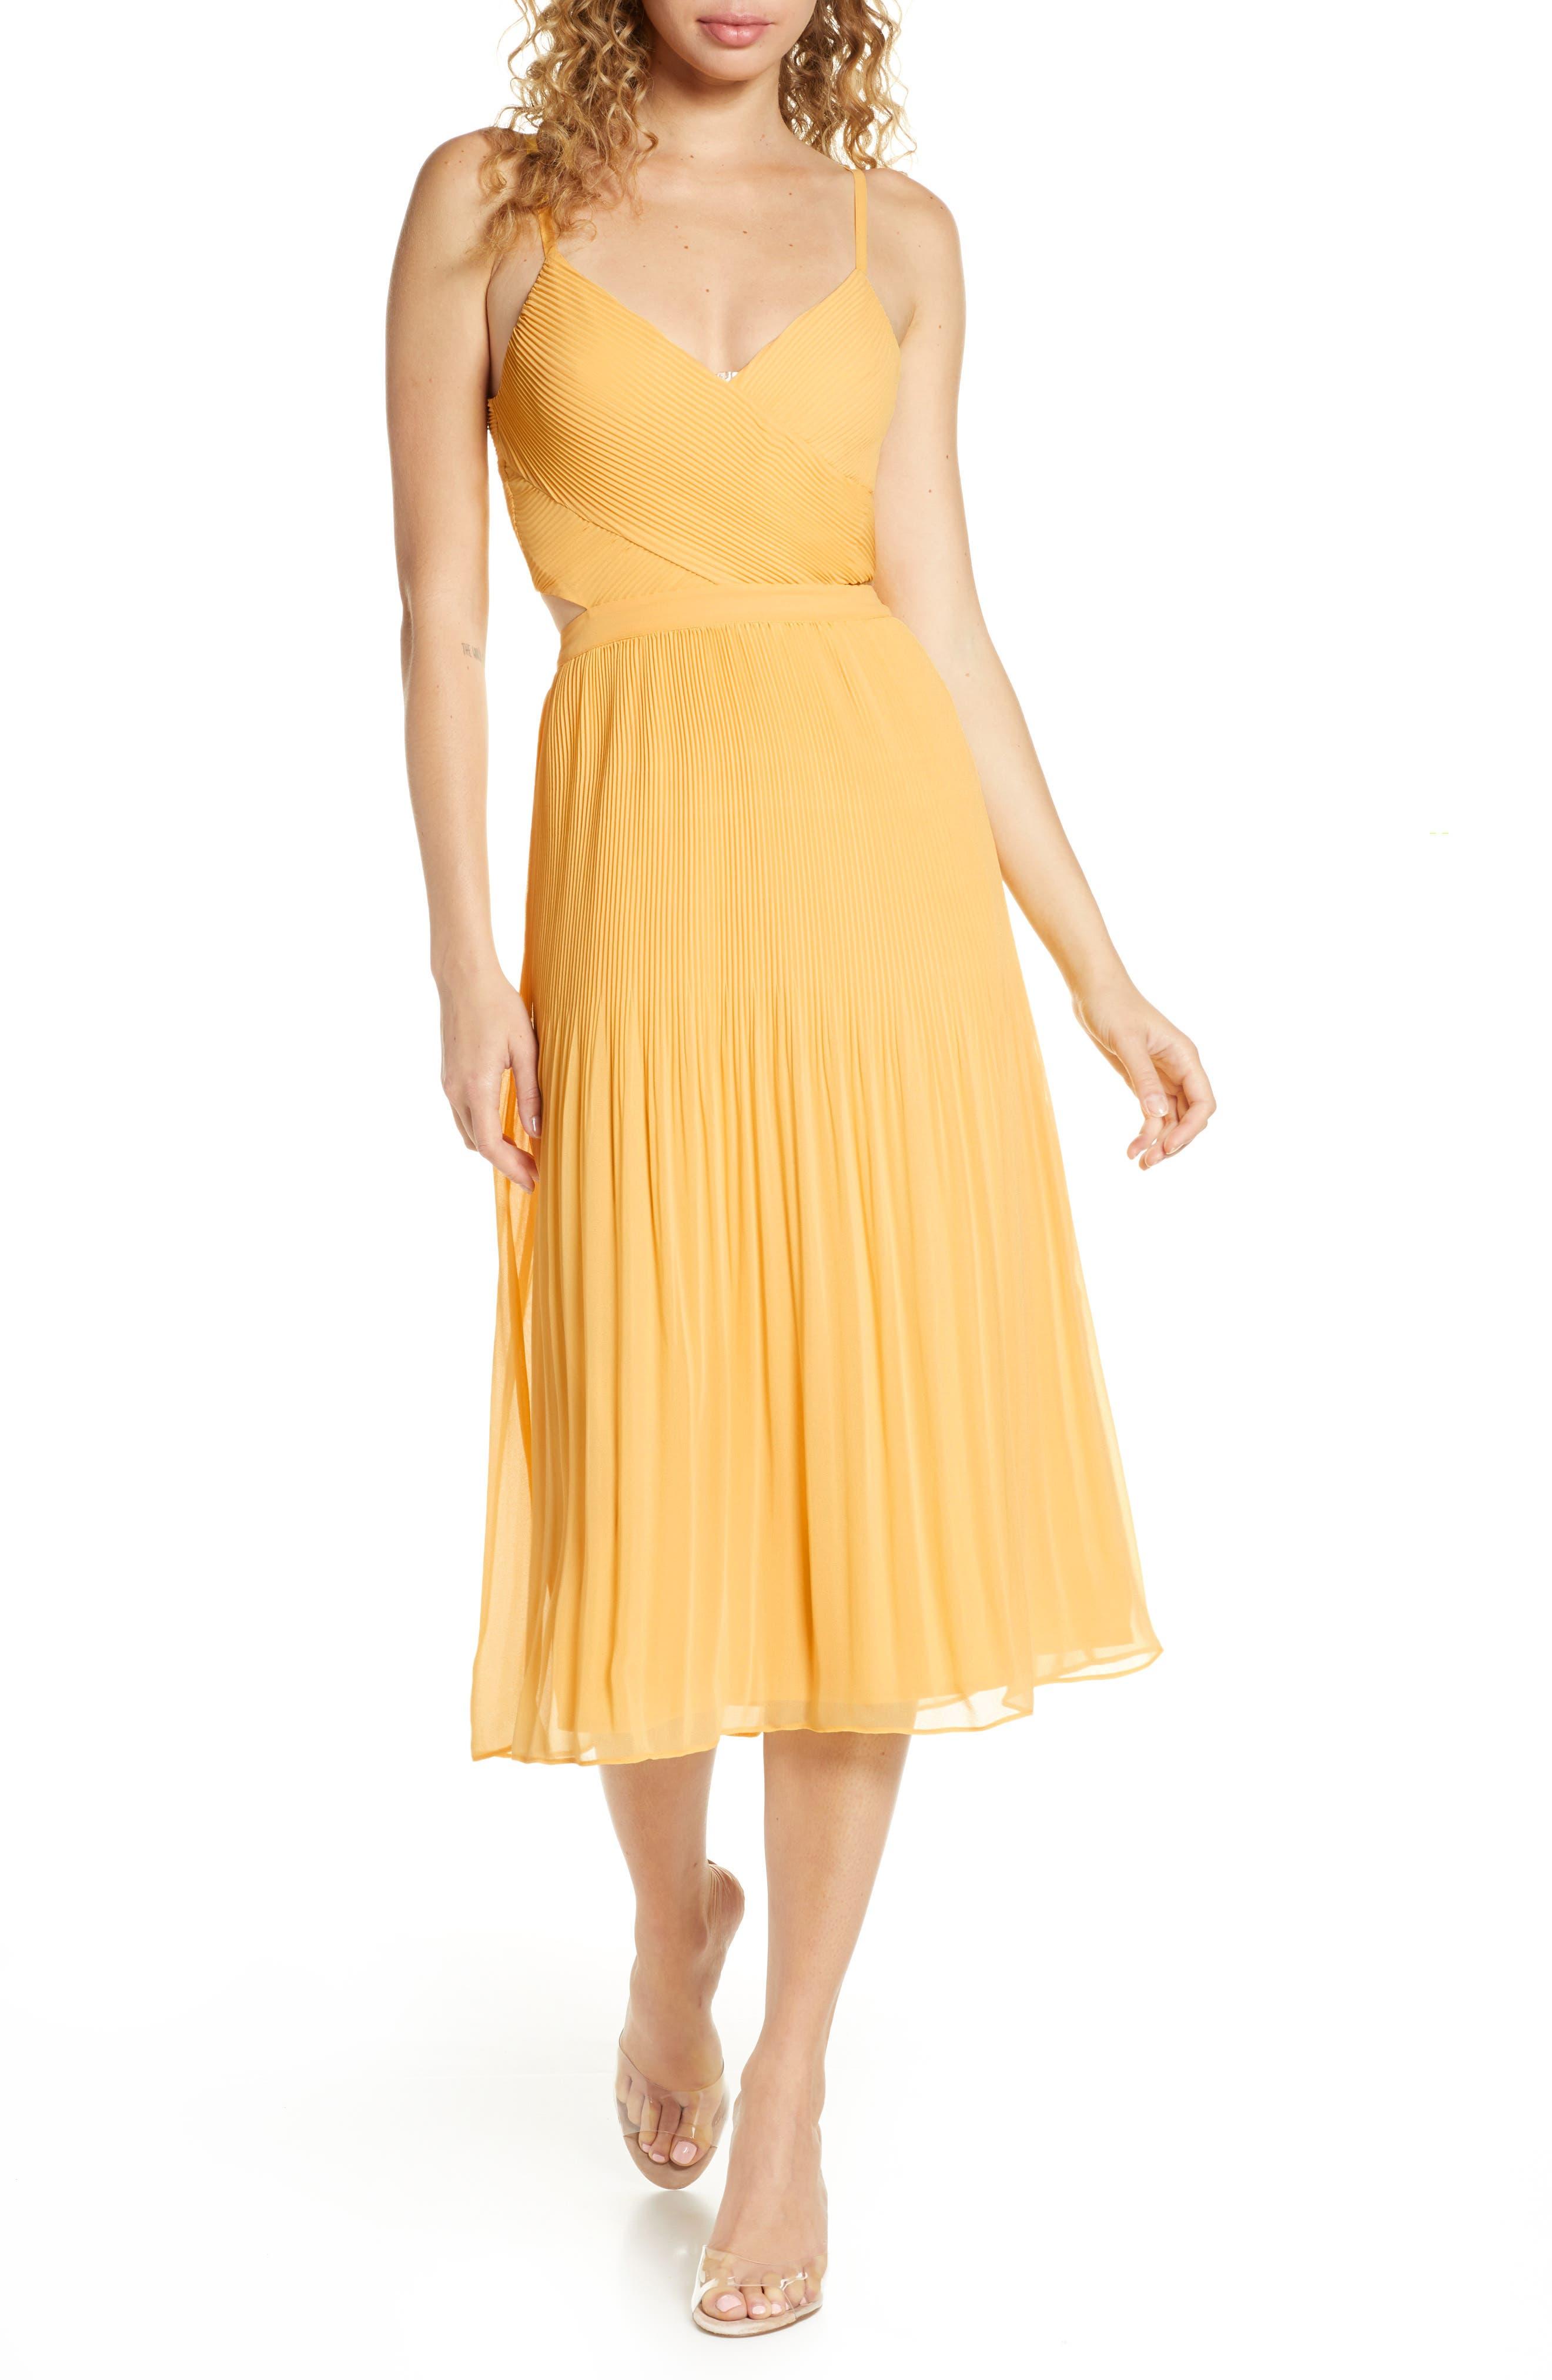 Ali & Jay For The Gram Chiffon Midi Dress, Yellow